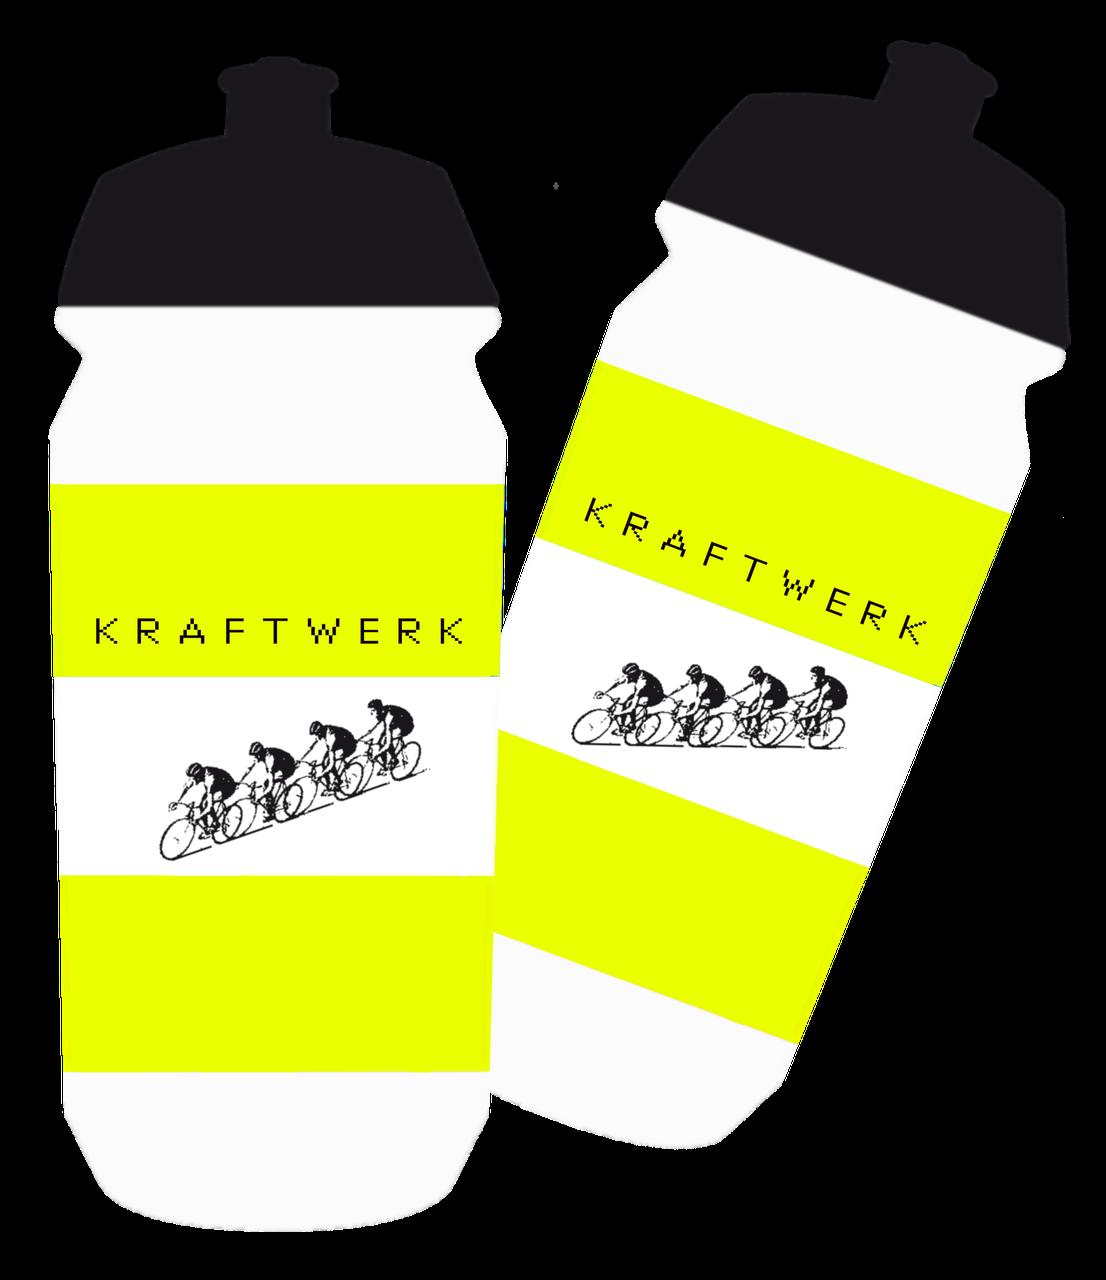 www.klingklangkonsumprodukt.com